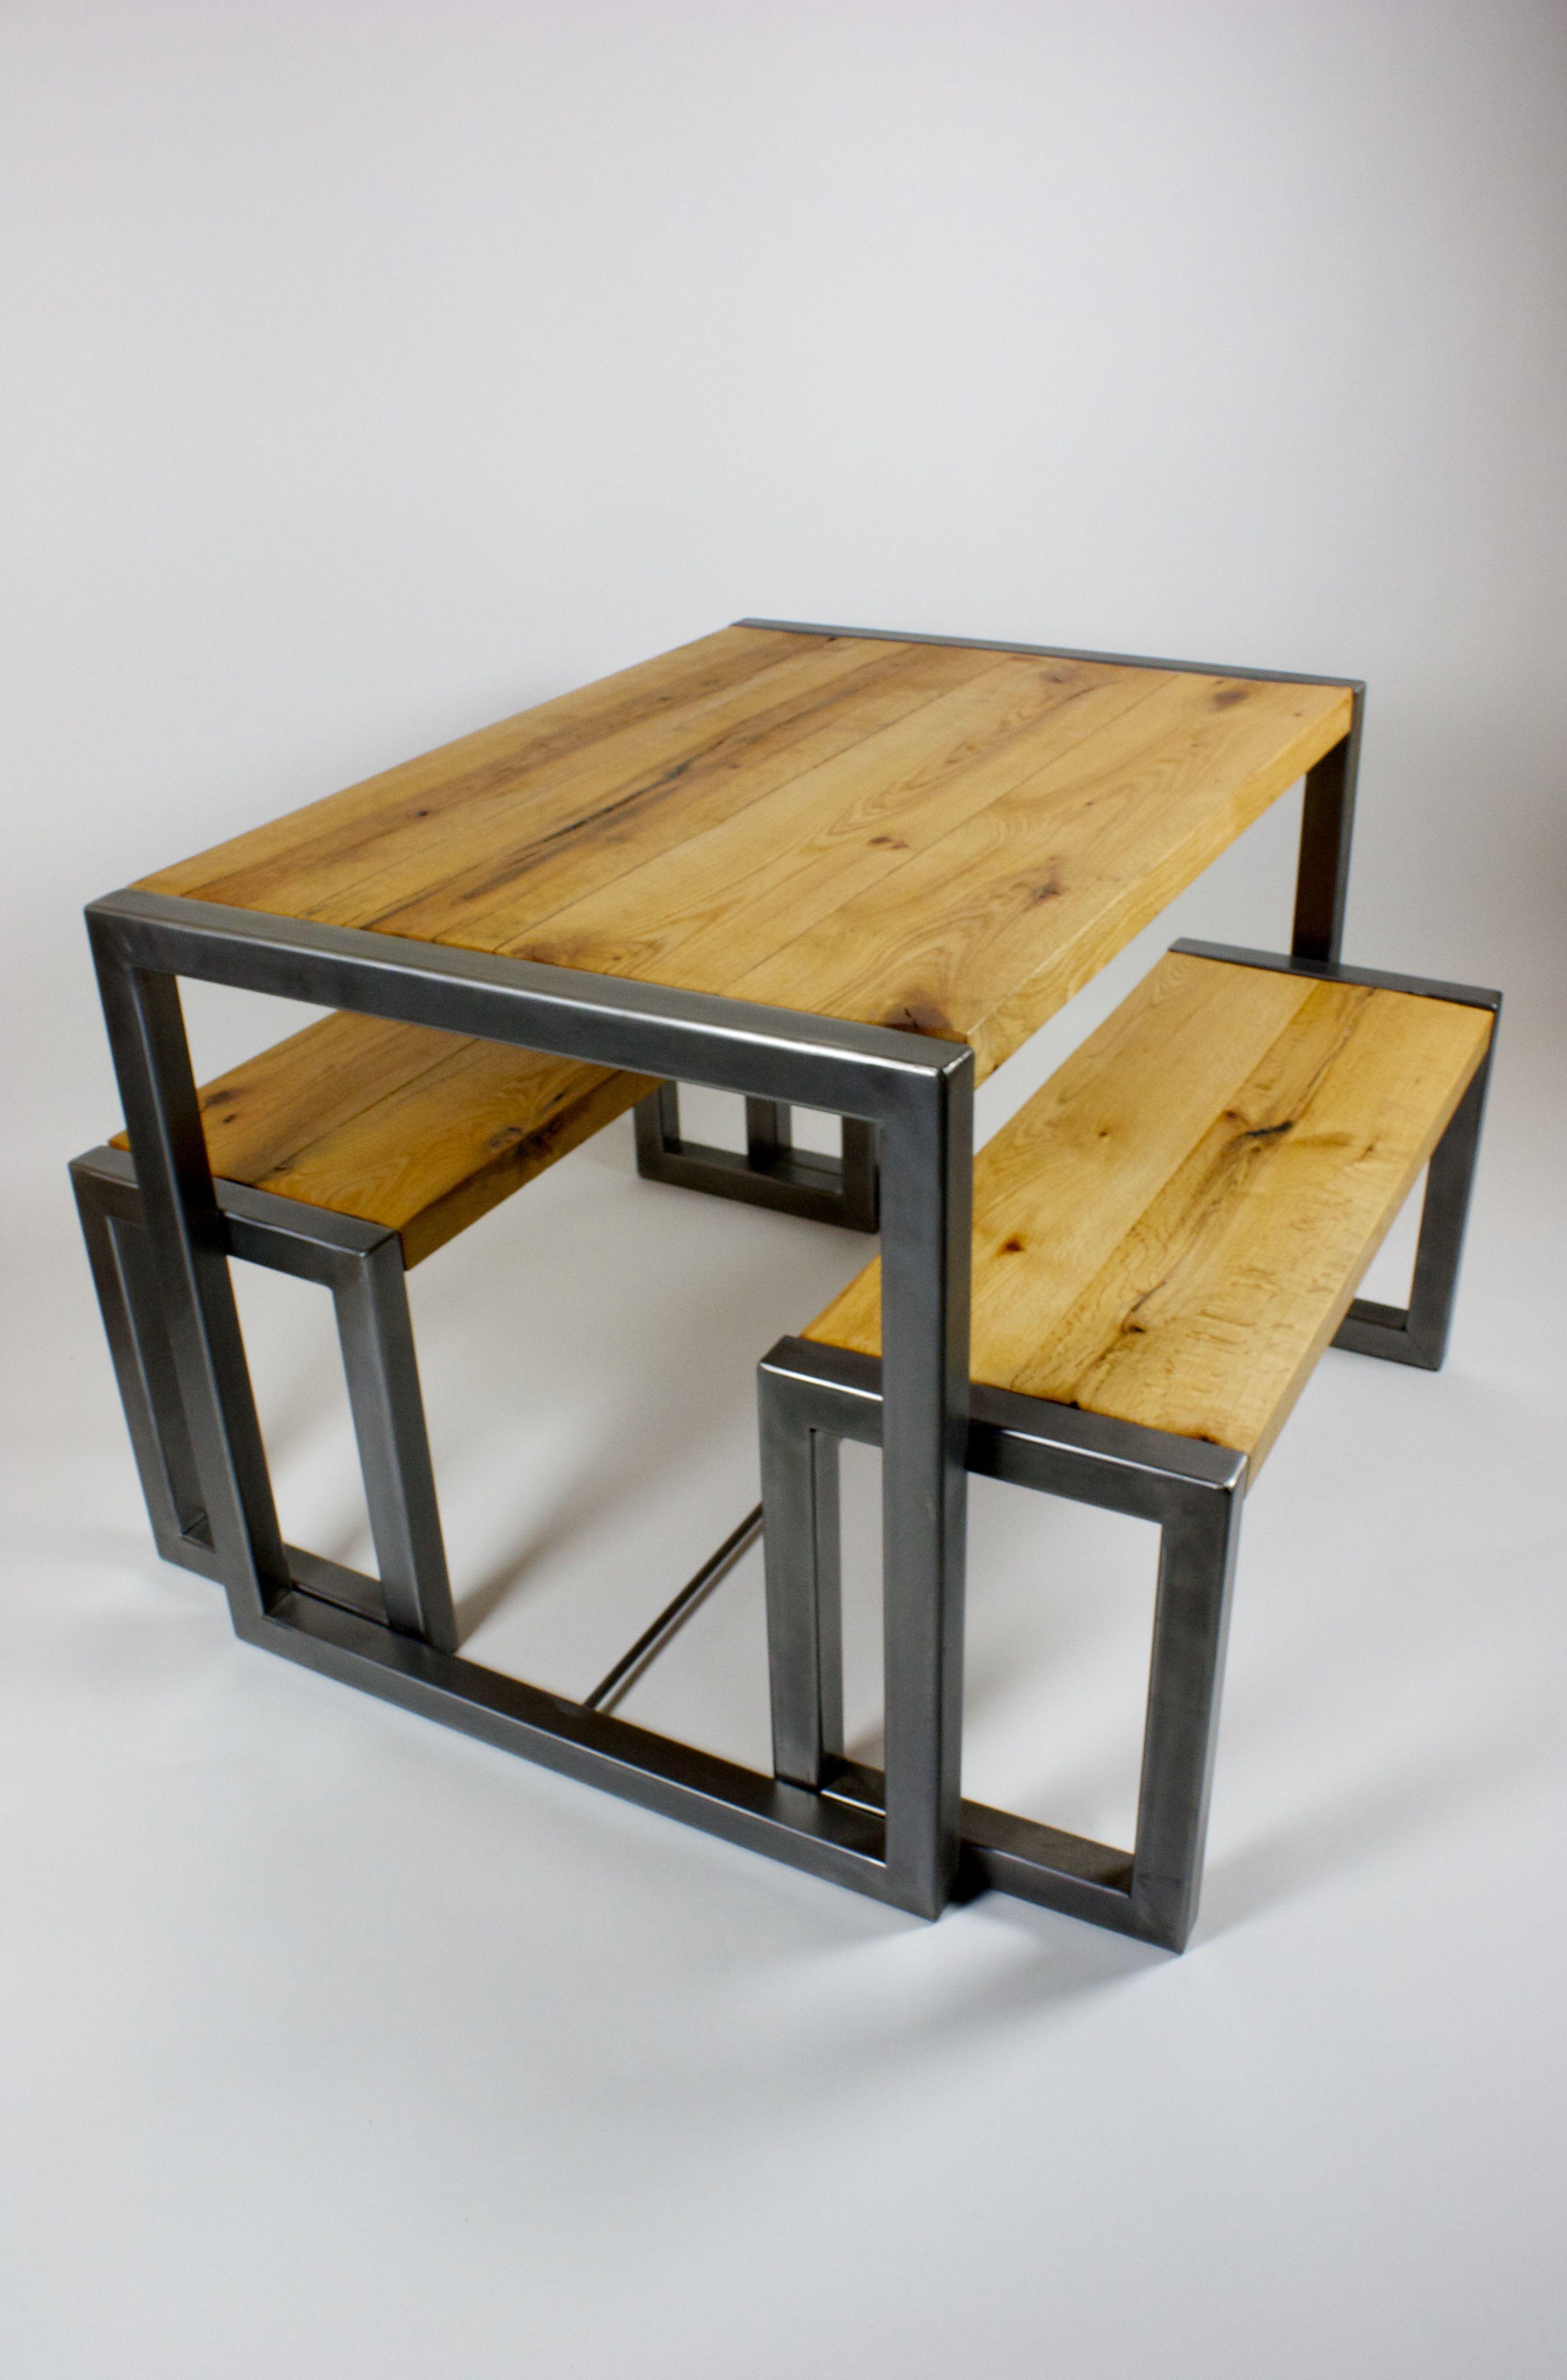 Oak And Polished Steel Table Set Cozinhas Industriais Rusticos Moveis Industriais Moveis Estilo Industrial